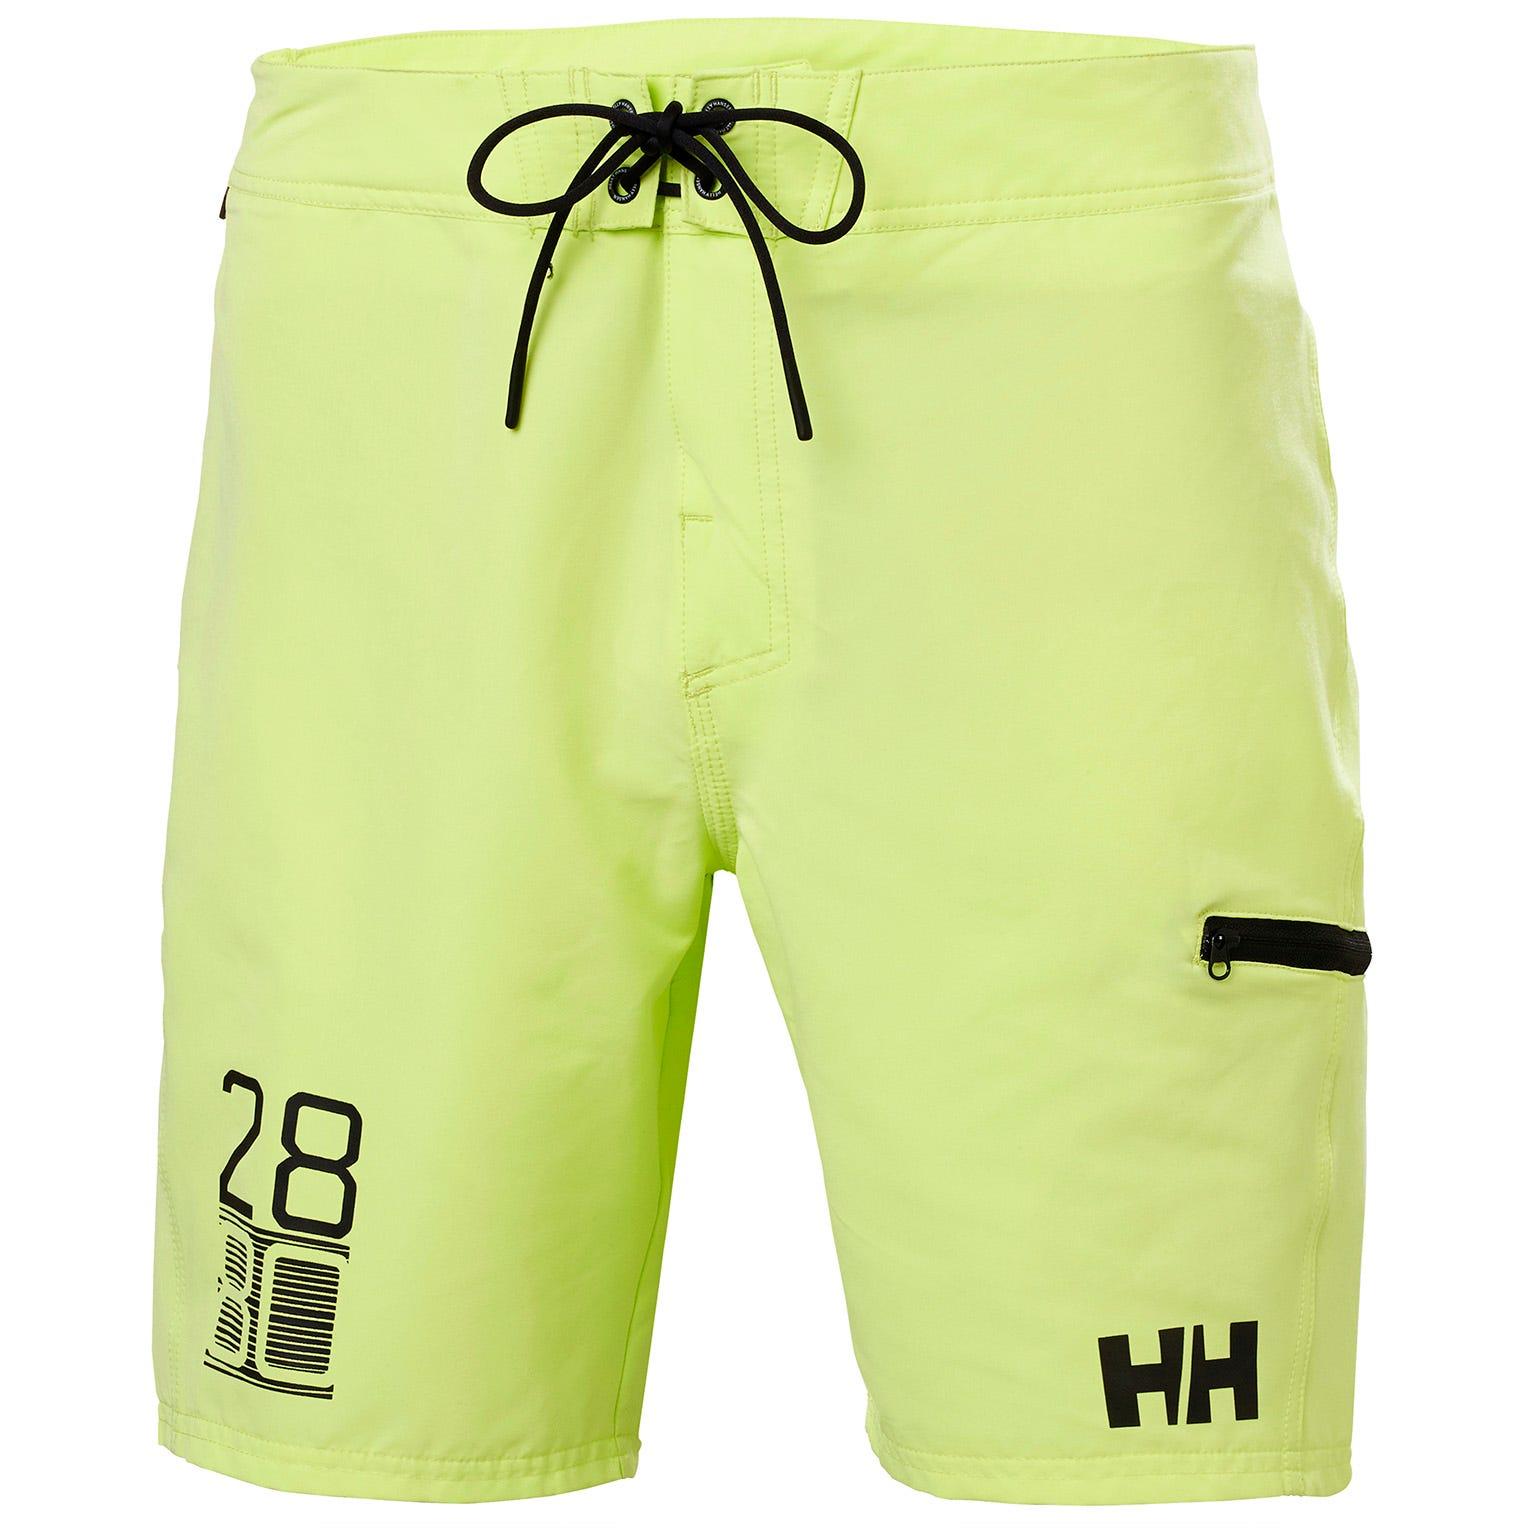 Helly Hansen Mens Hp 9 Quick-dry Board Shorts Green 33